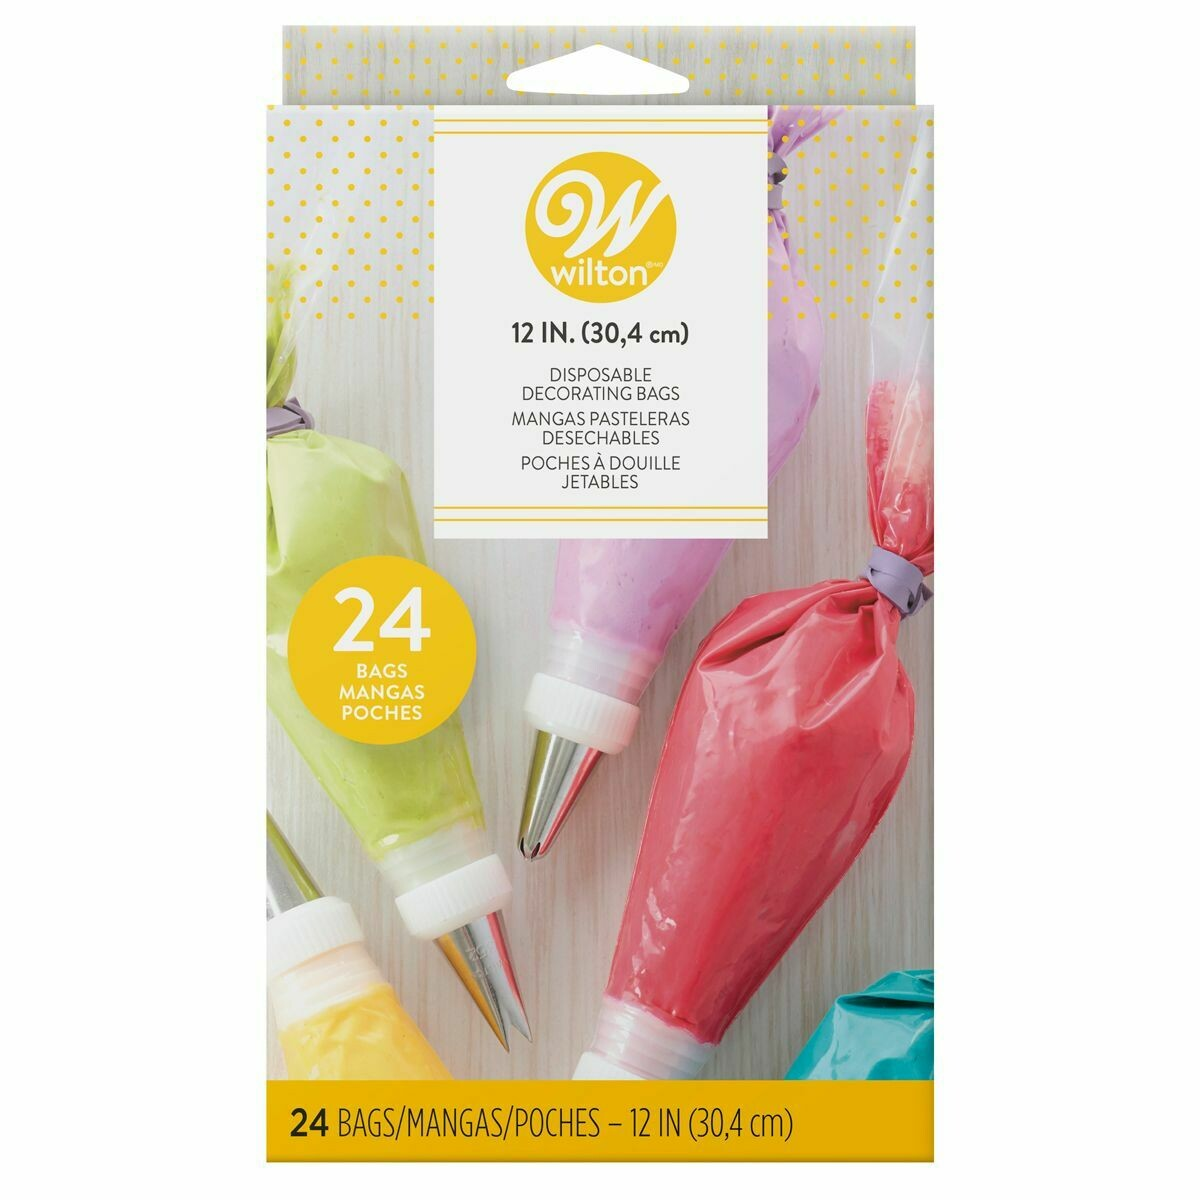 Wilton Disposable Decorating Bags 30εκ -24τμχ - Σακούλες Ζαχαροπλαστικής/Κορνέ μιας χρήσης 30εκ